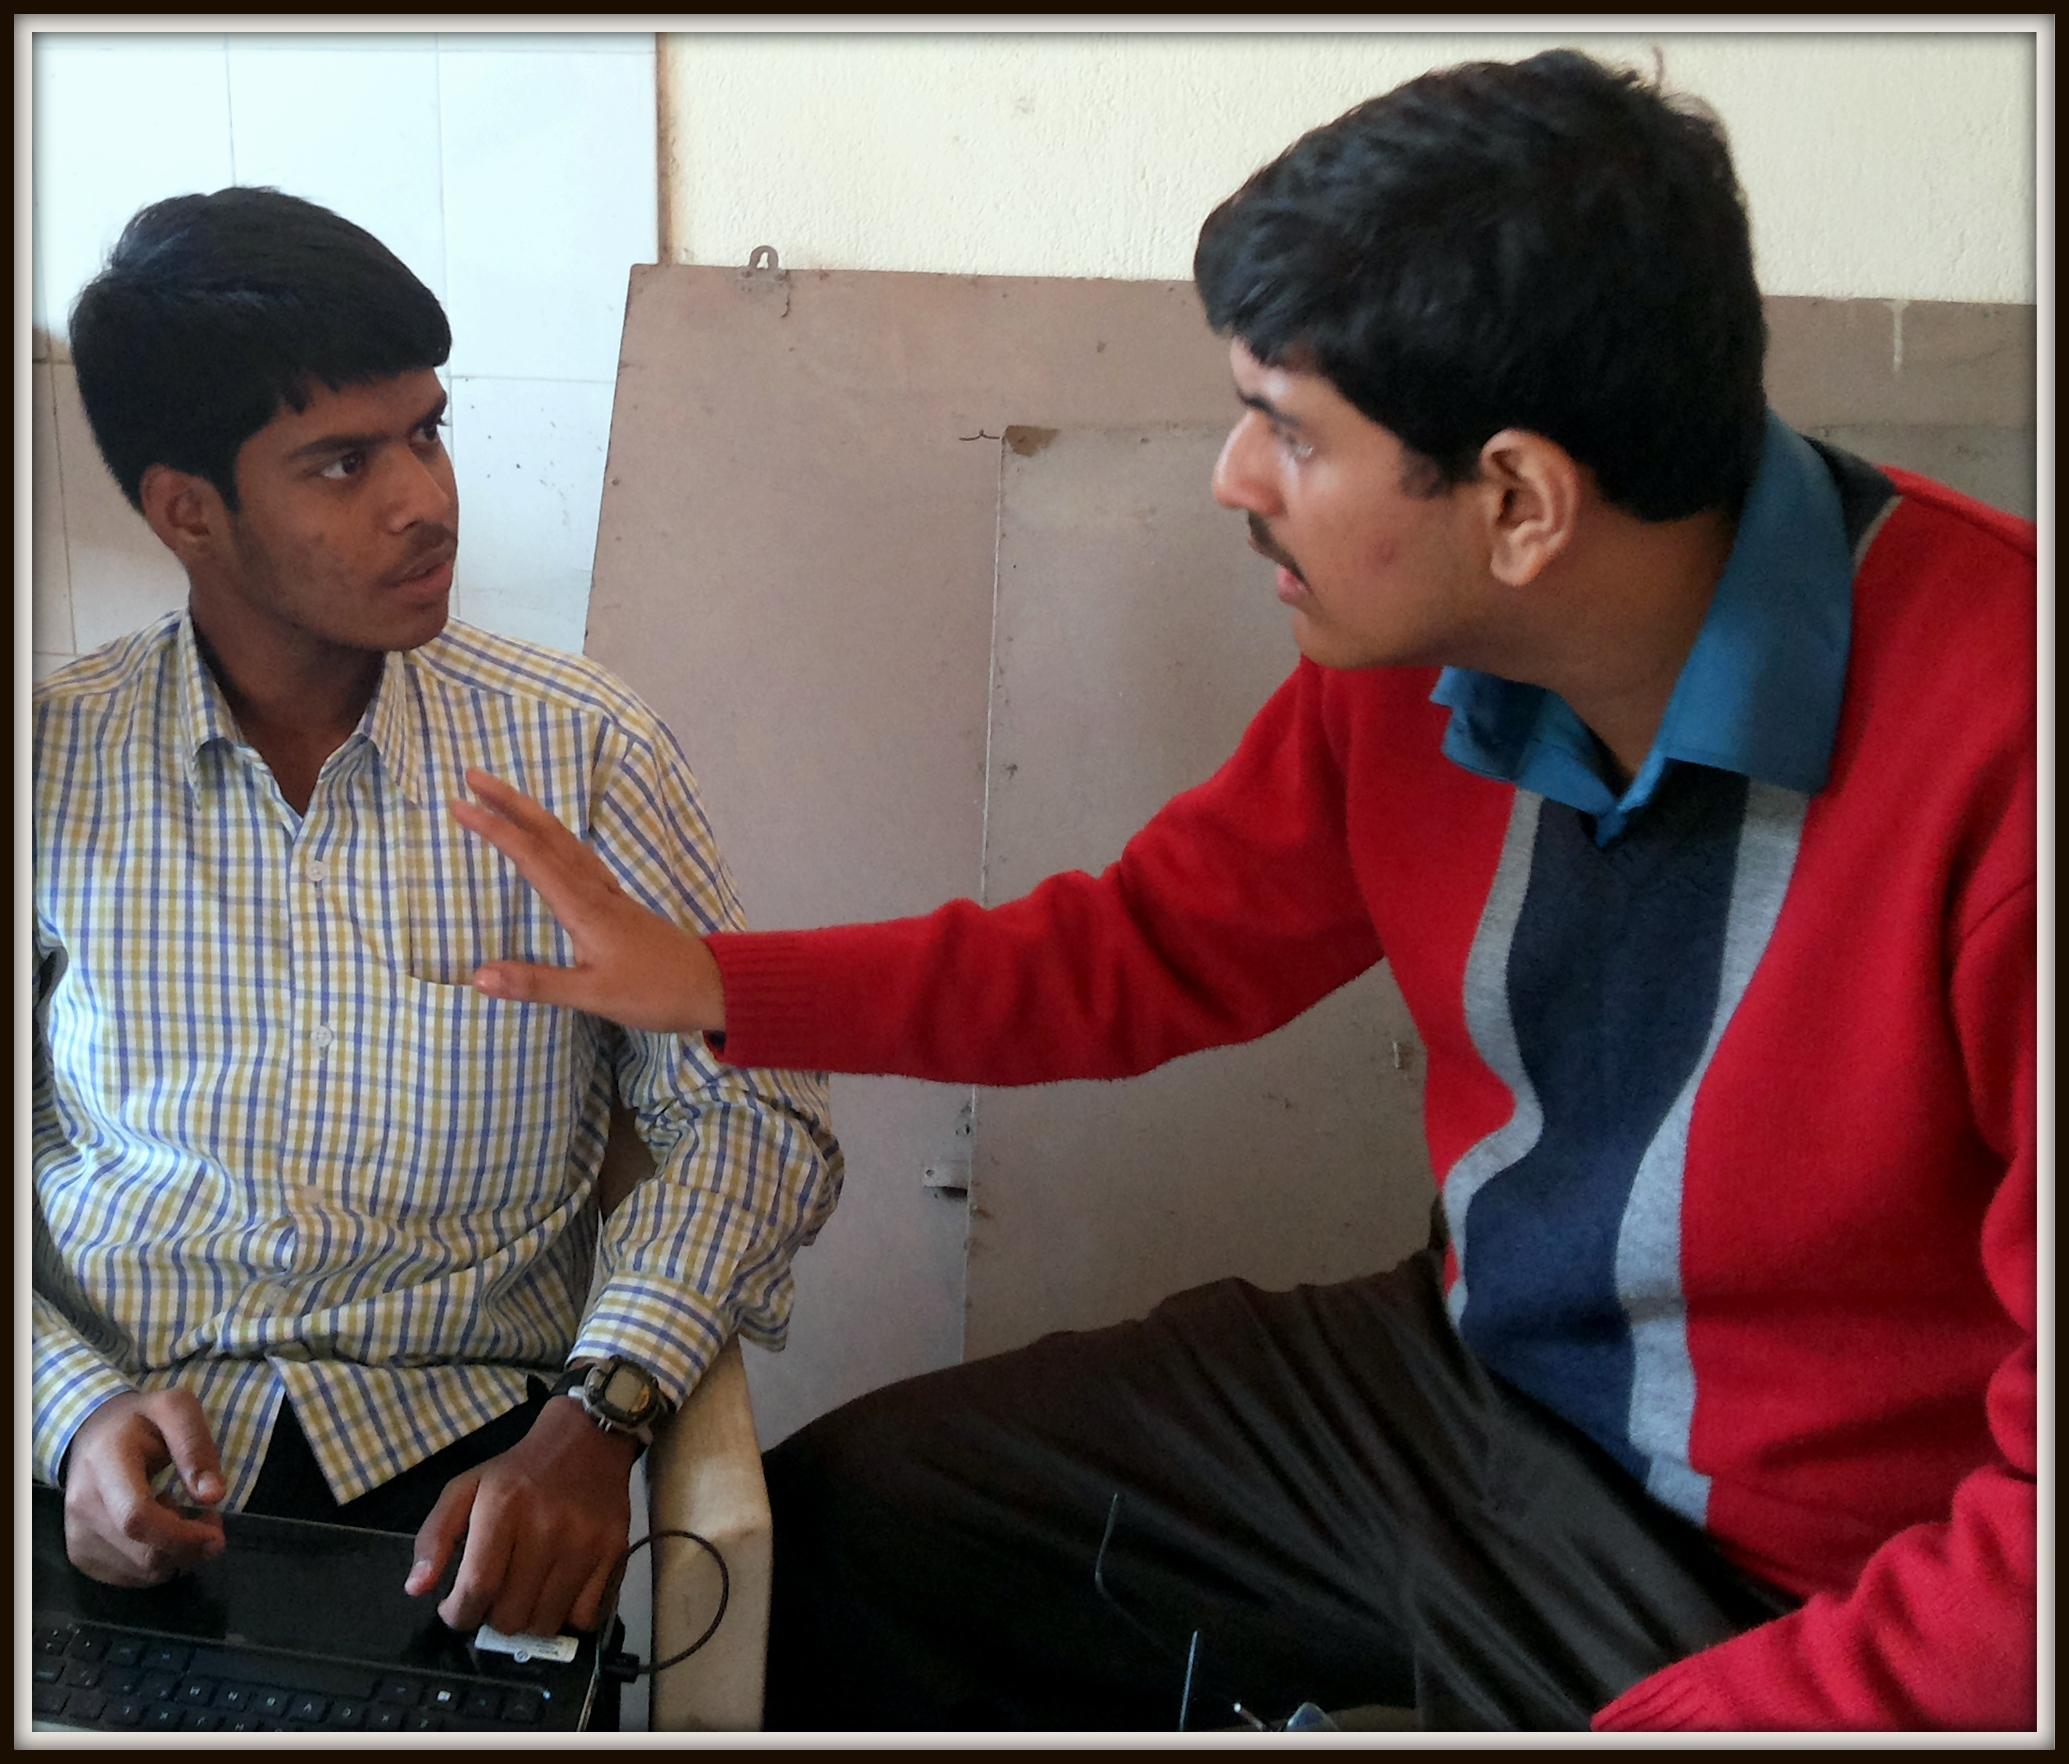 Jayant Bhawal and Sagnik Chatterjee debating God vs Science. (Image just for visual representation)